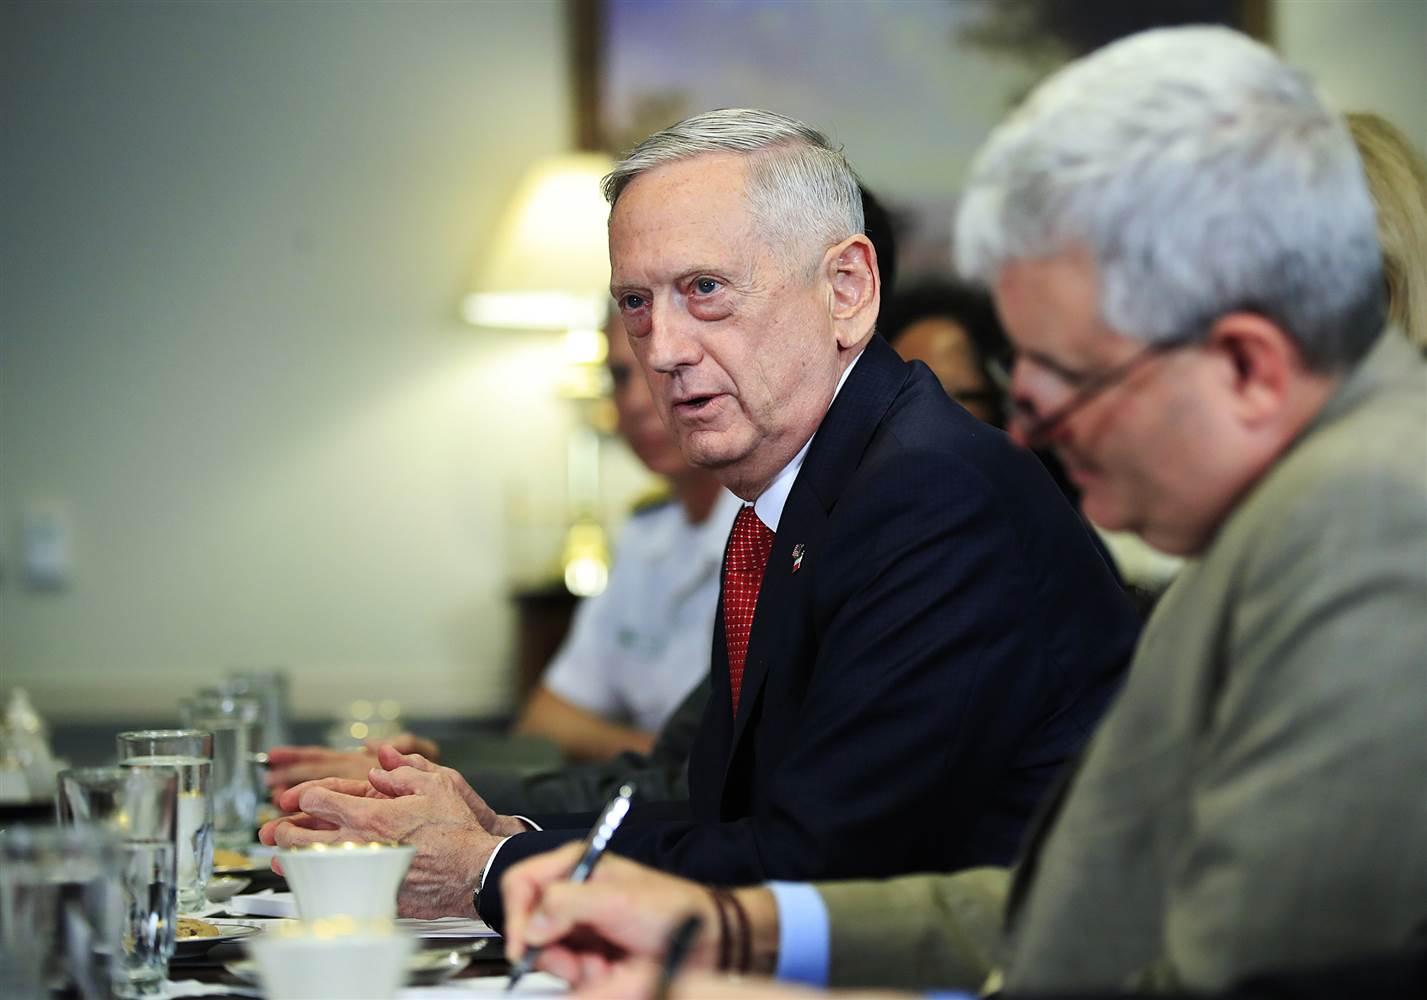 Defense Secretary Jim Mattis speaks during his meeting with Italy's Defense Minister Roberta Pinotti on July 11, 2017, at the Pentagon. (Manuel Balce Ceneta / AP)